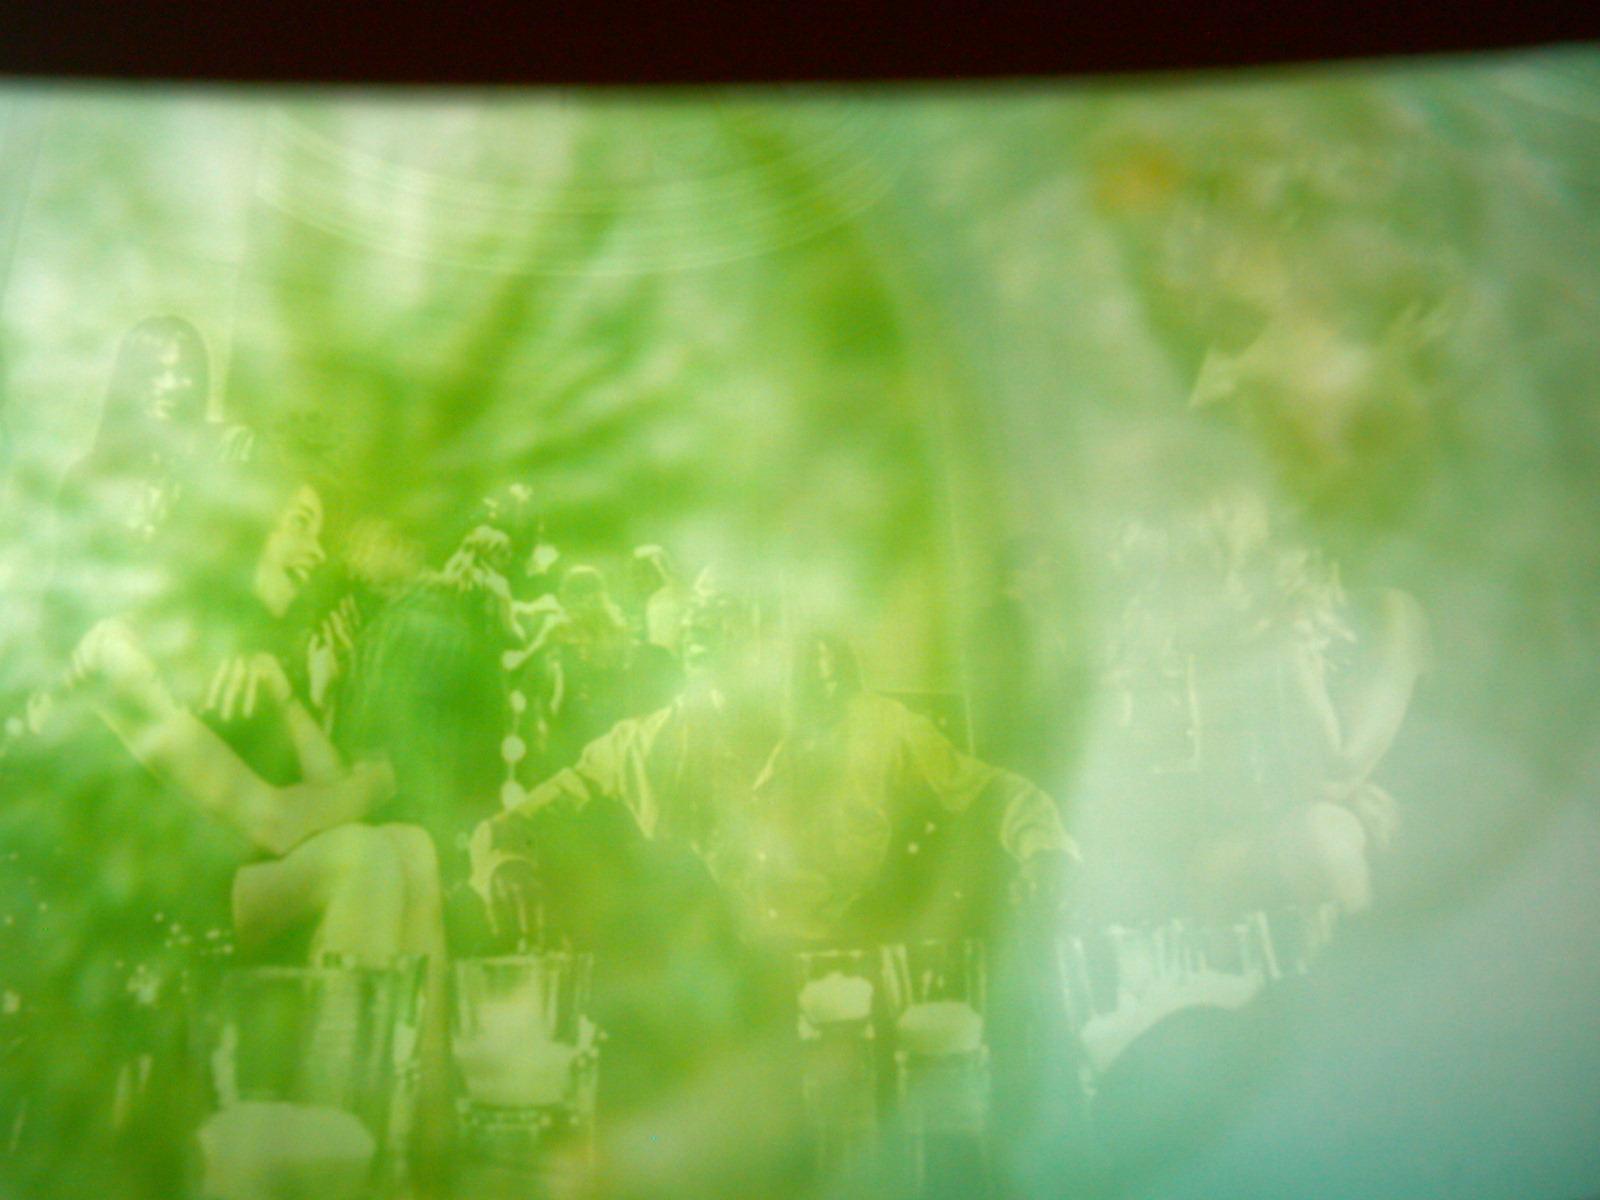 blurs blur club disco bar crowd humanoids humans green haze woman